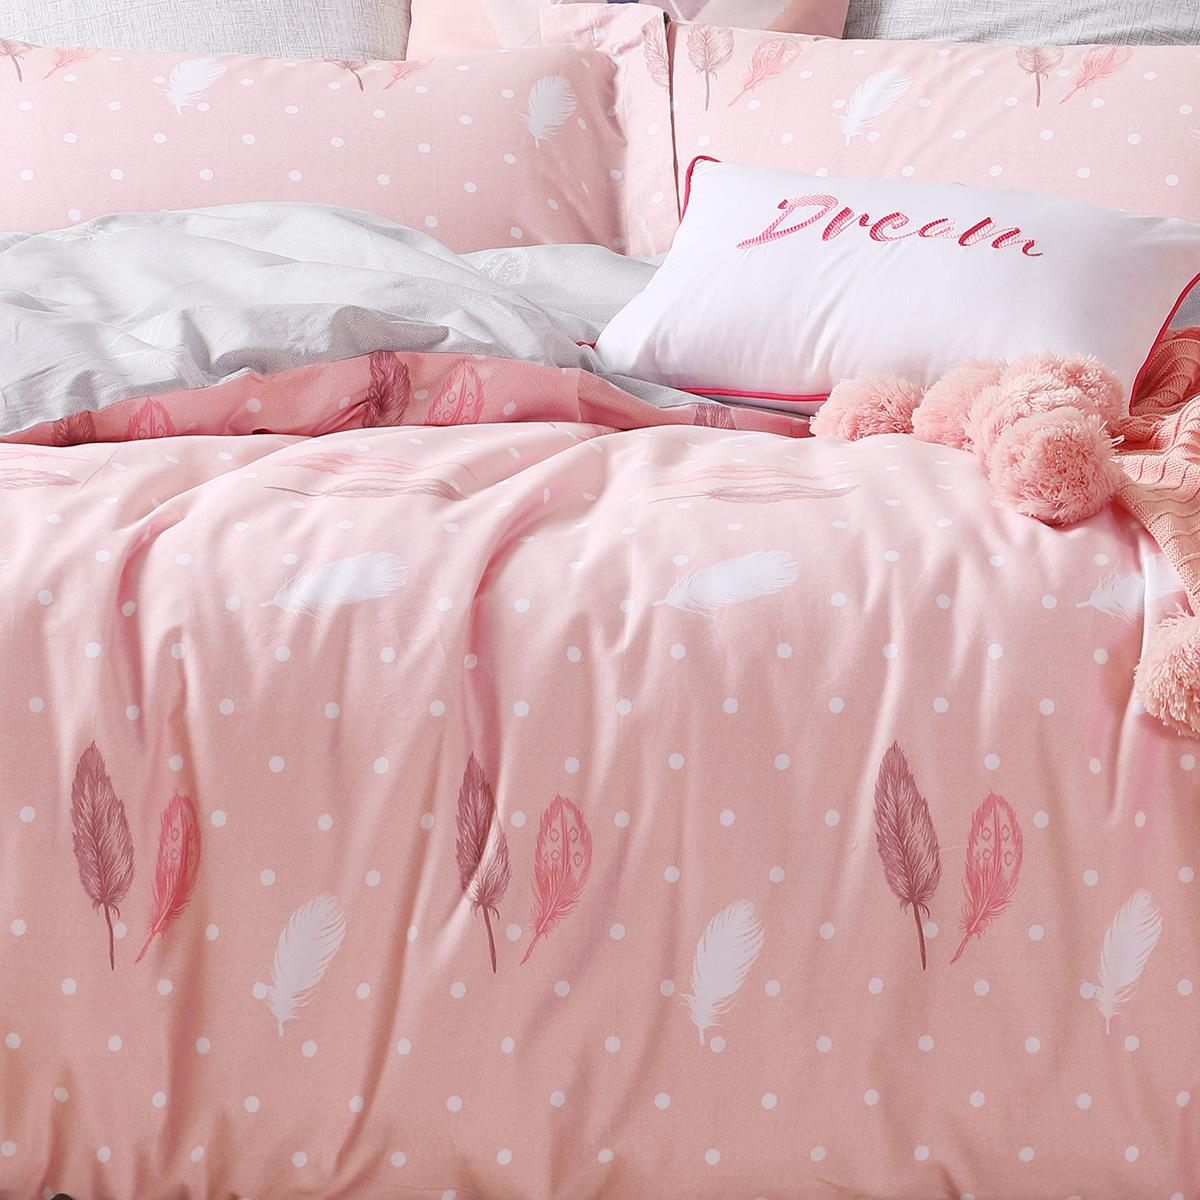 ins 水星家纺纯棉四件套全棉花卉倾颜倾羽双人床上用品床单被罩